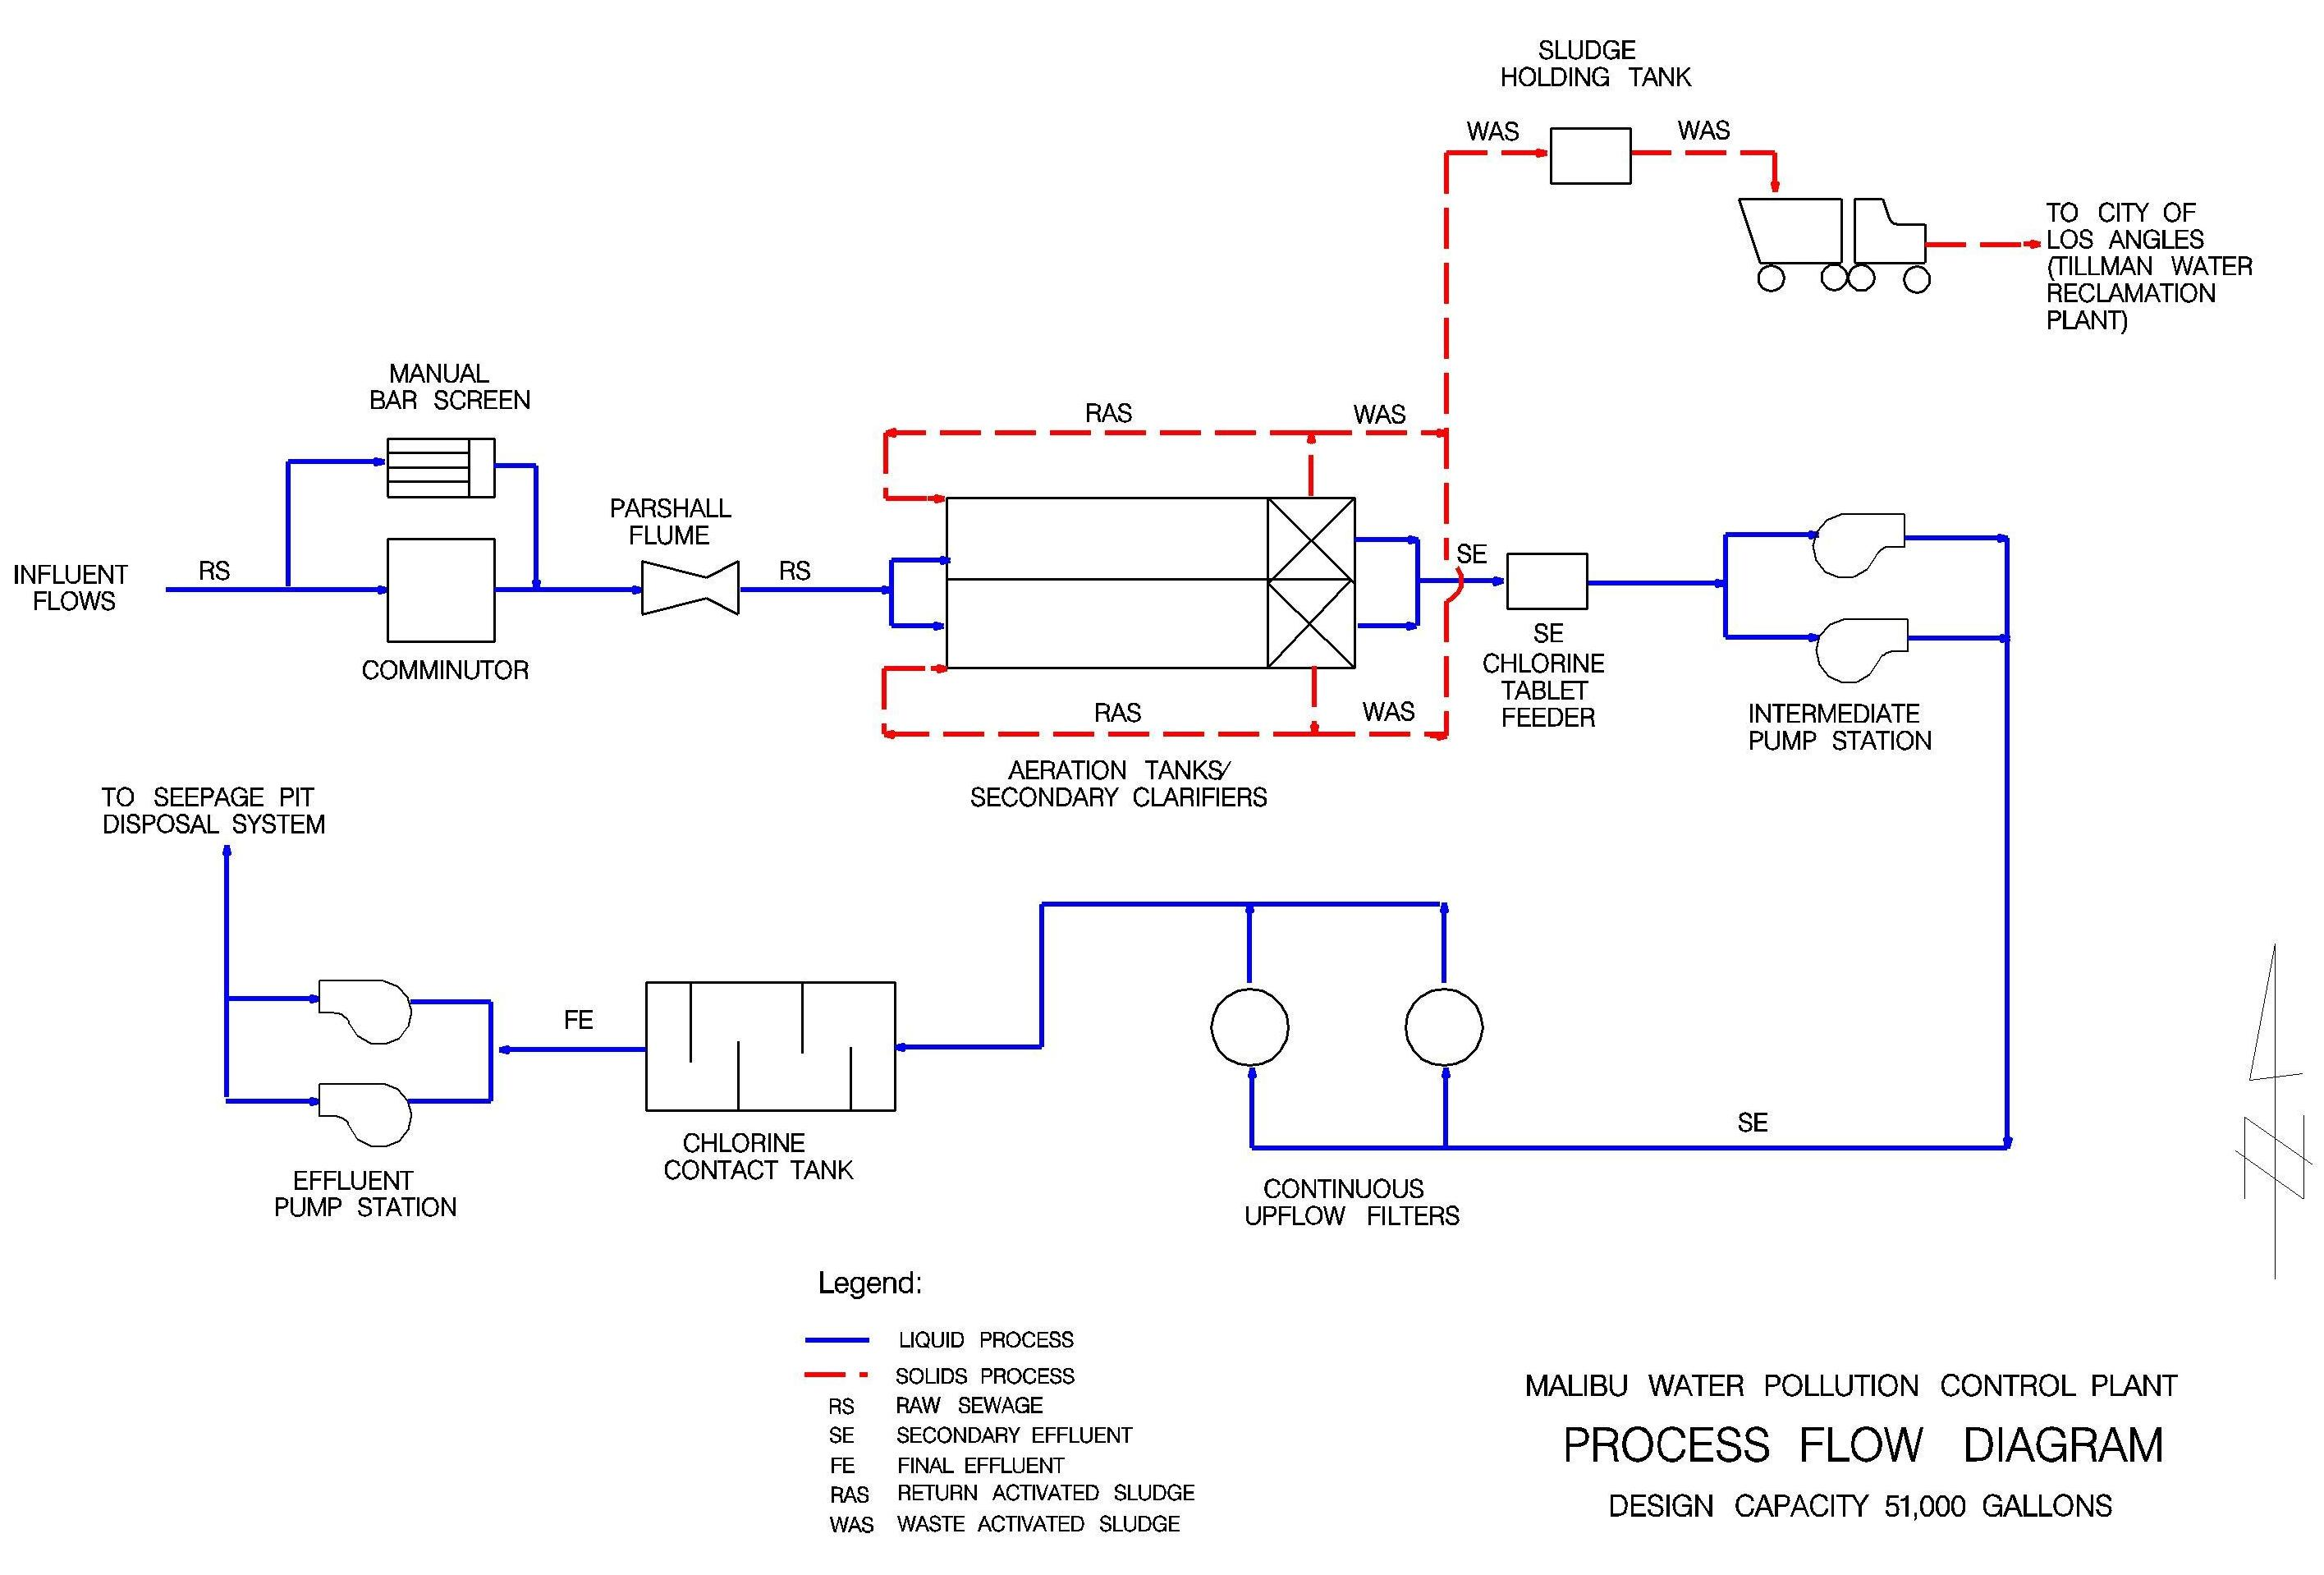 Figure 3 1 Flow Diagram